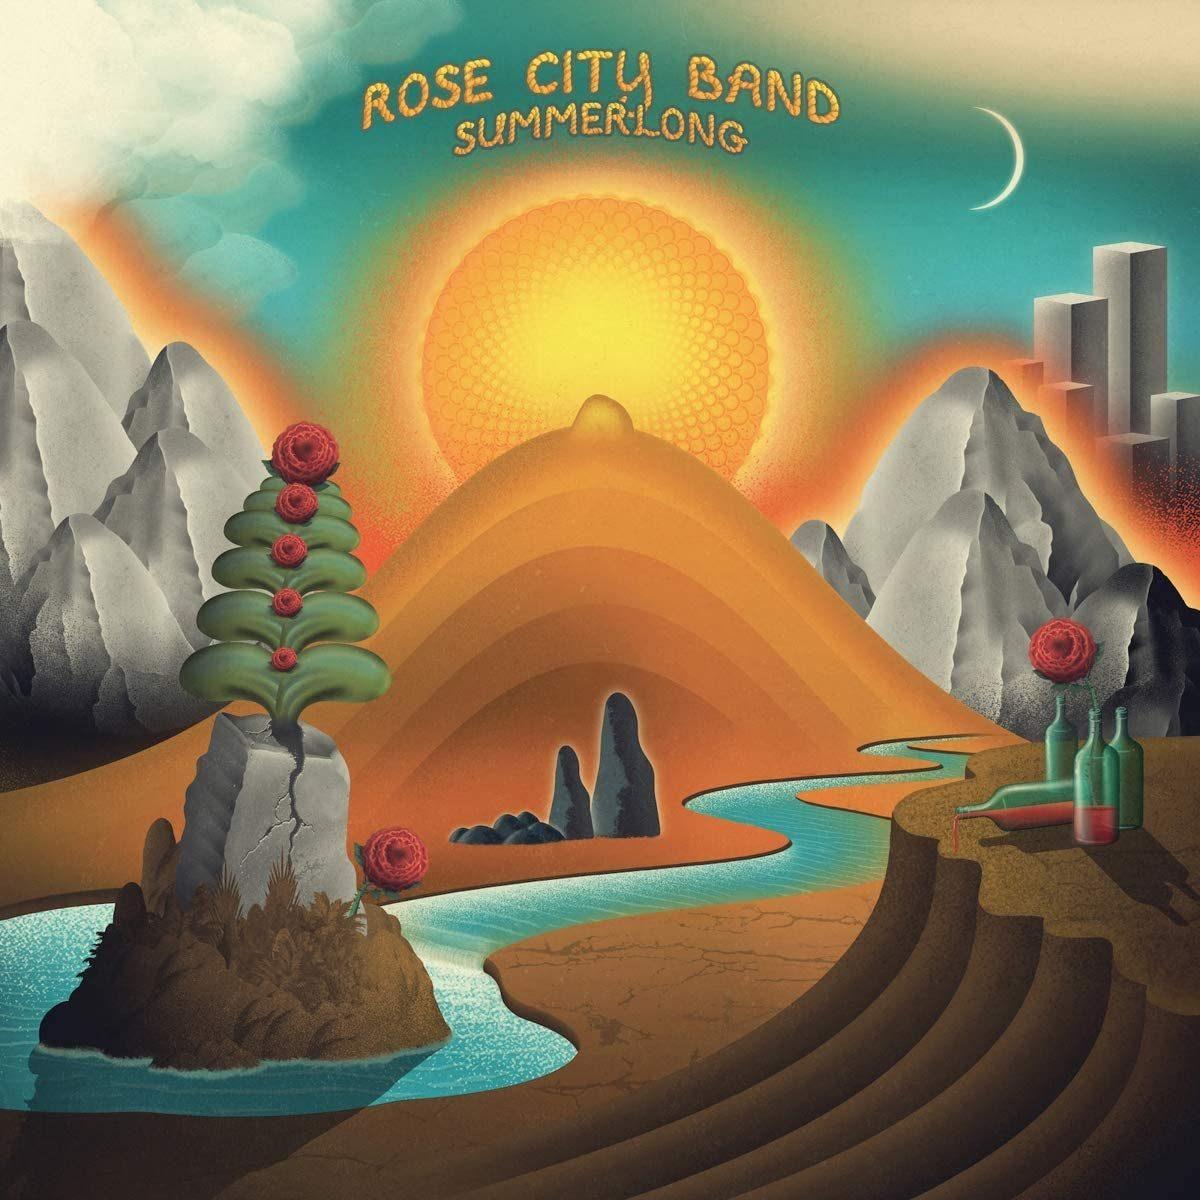 ROSE CITY BAND Summerlong